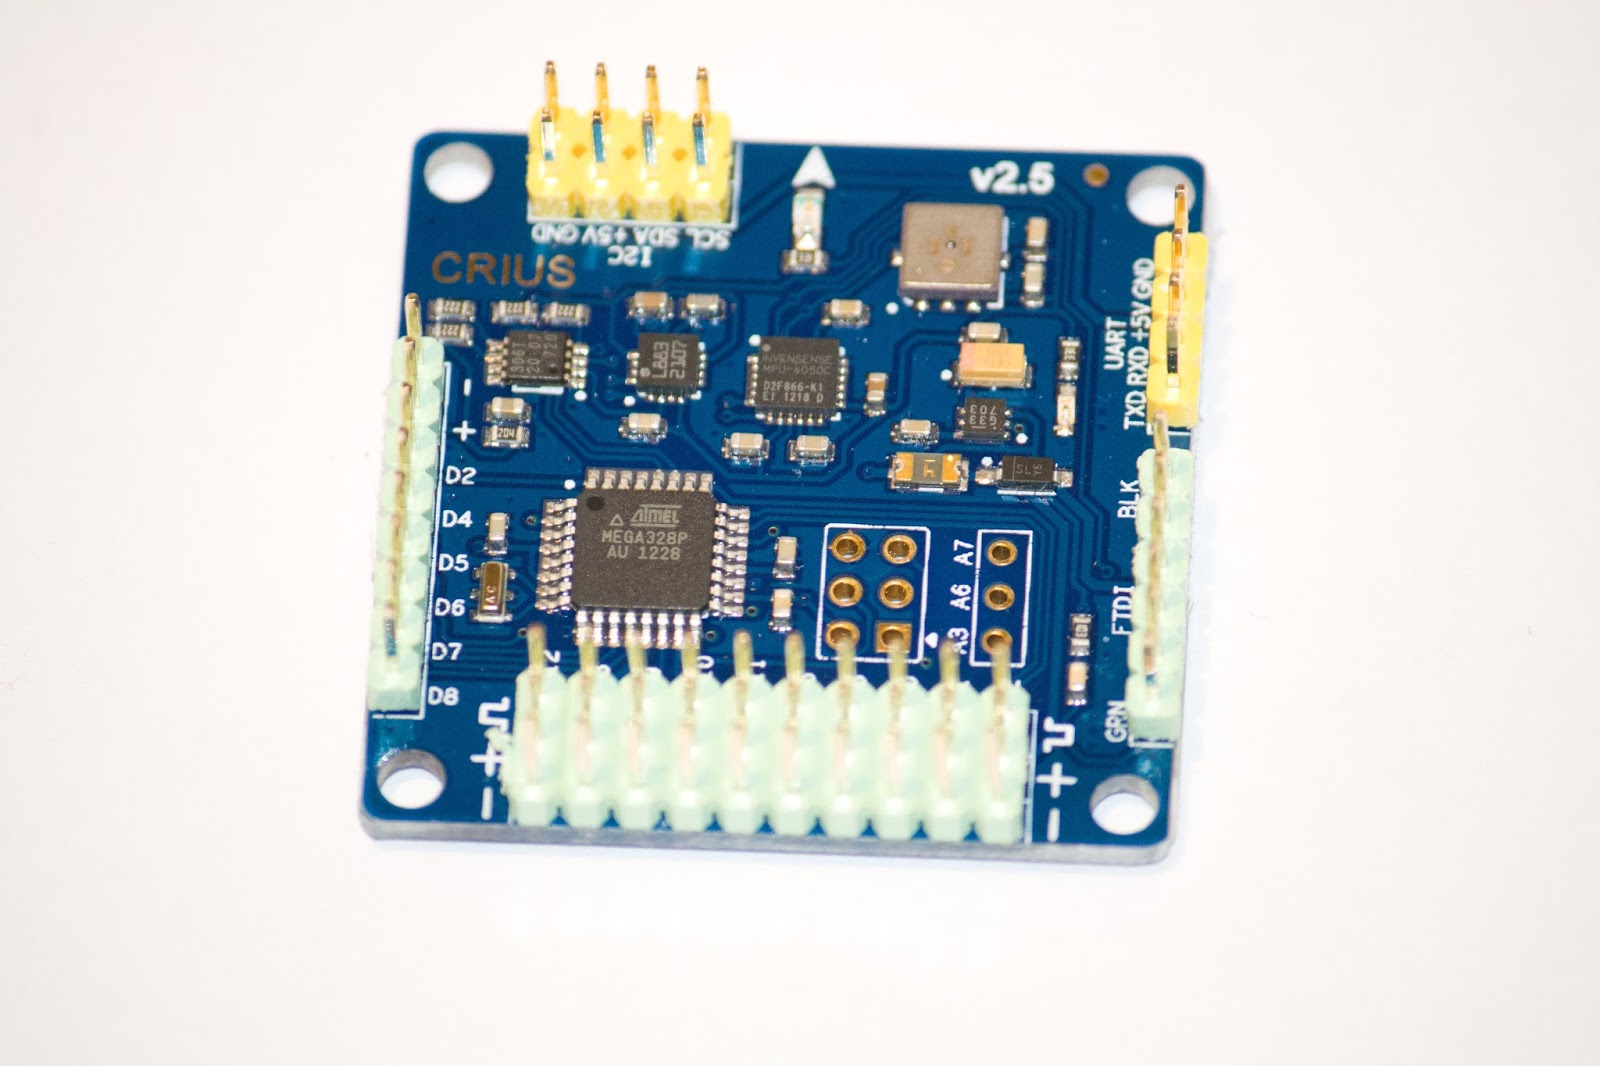 crius multiwii v2 5 rc timer hp2812 1000kv motors quadcopter atmega 328p microcontroller • mpu6050c 6 axis gyro accel motion processing unit • hmc5883l 3 axis digital magnetometer • bmp085 digital pressure sensor